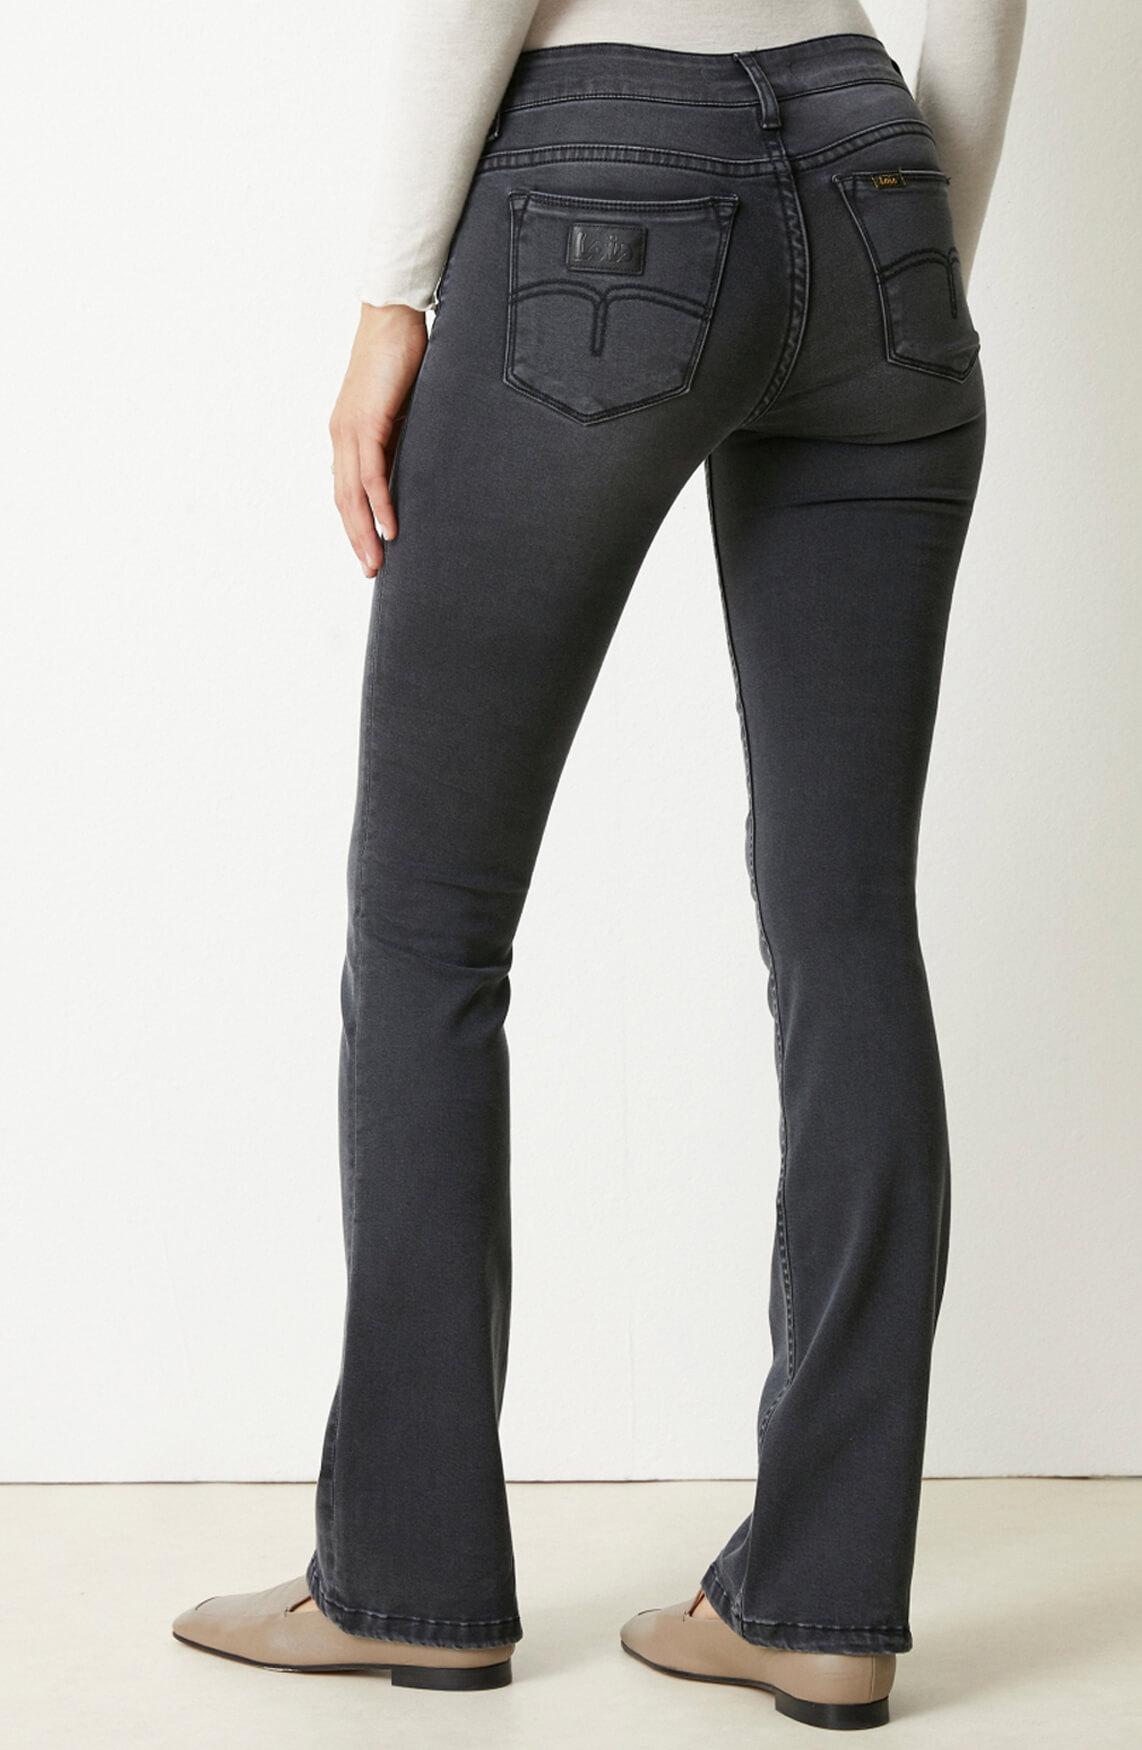 Lois Dames L32 Melrose jeans zwart